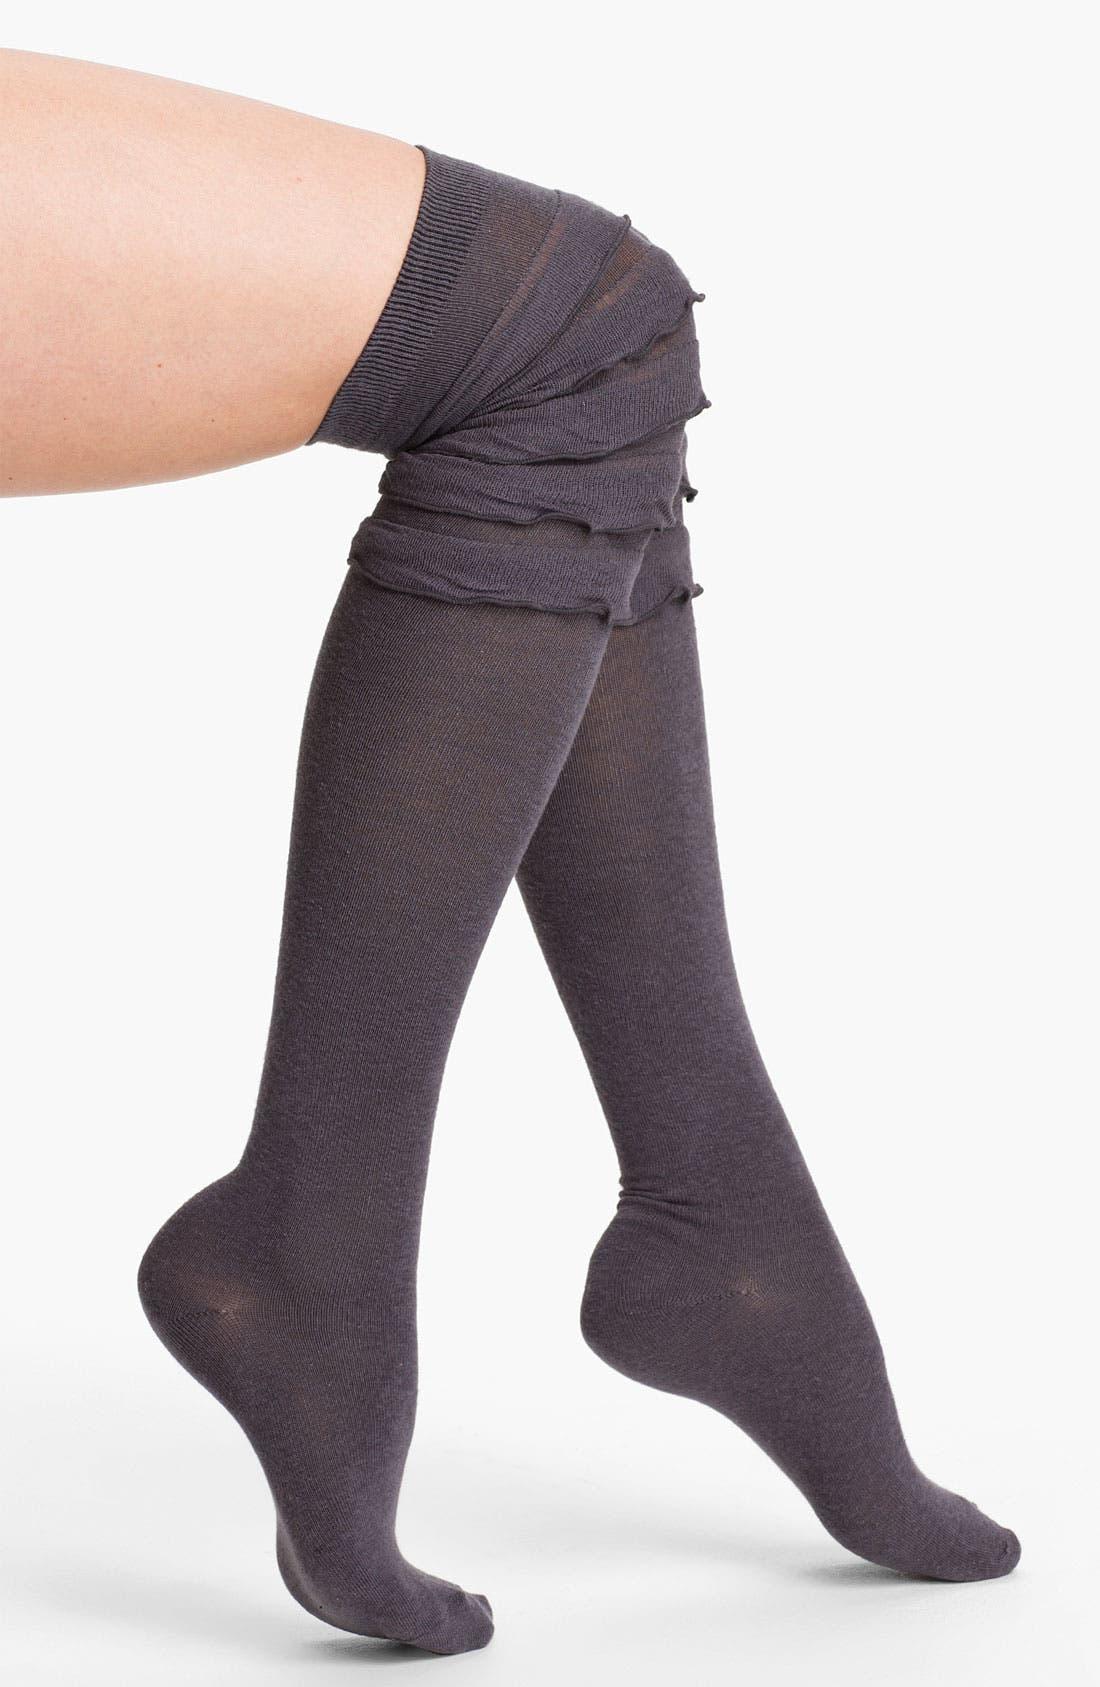 Alternate Image 1 Selected - Free People Ruffle Over-the-Knee Socks